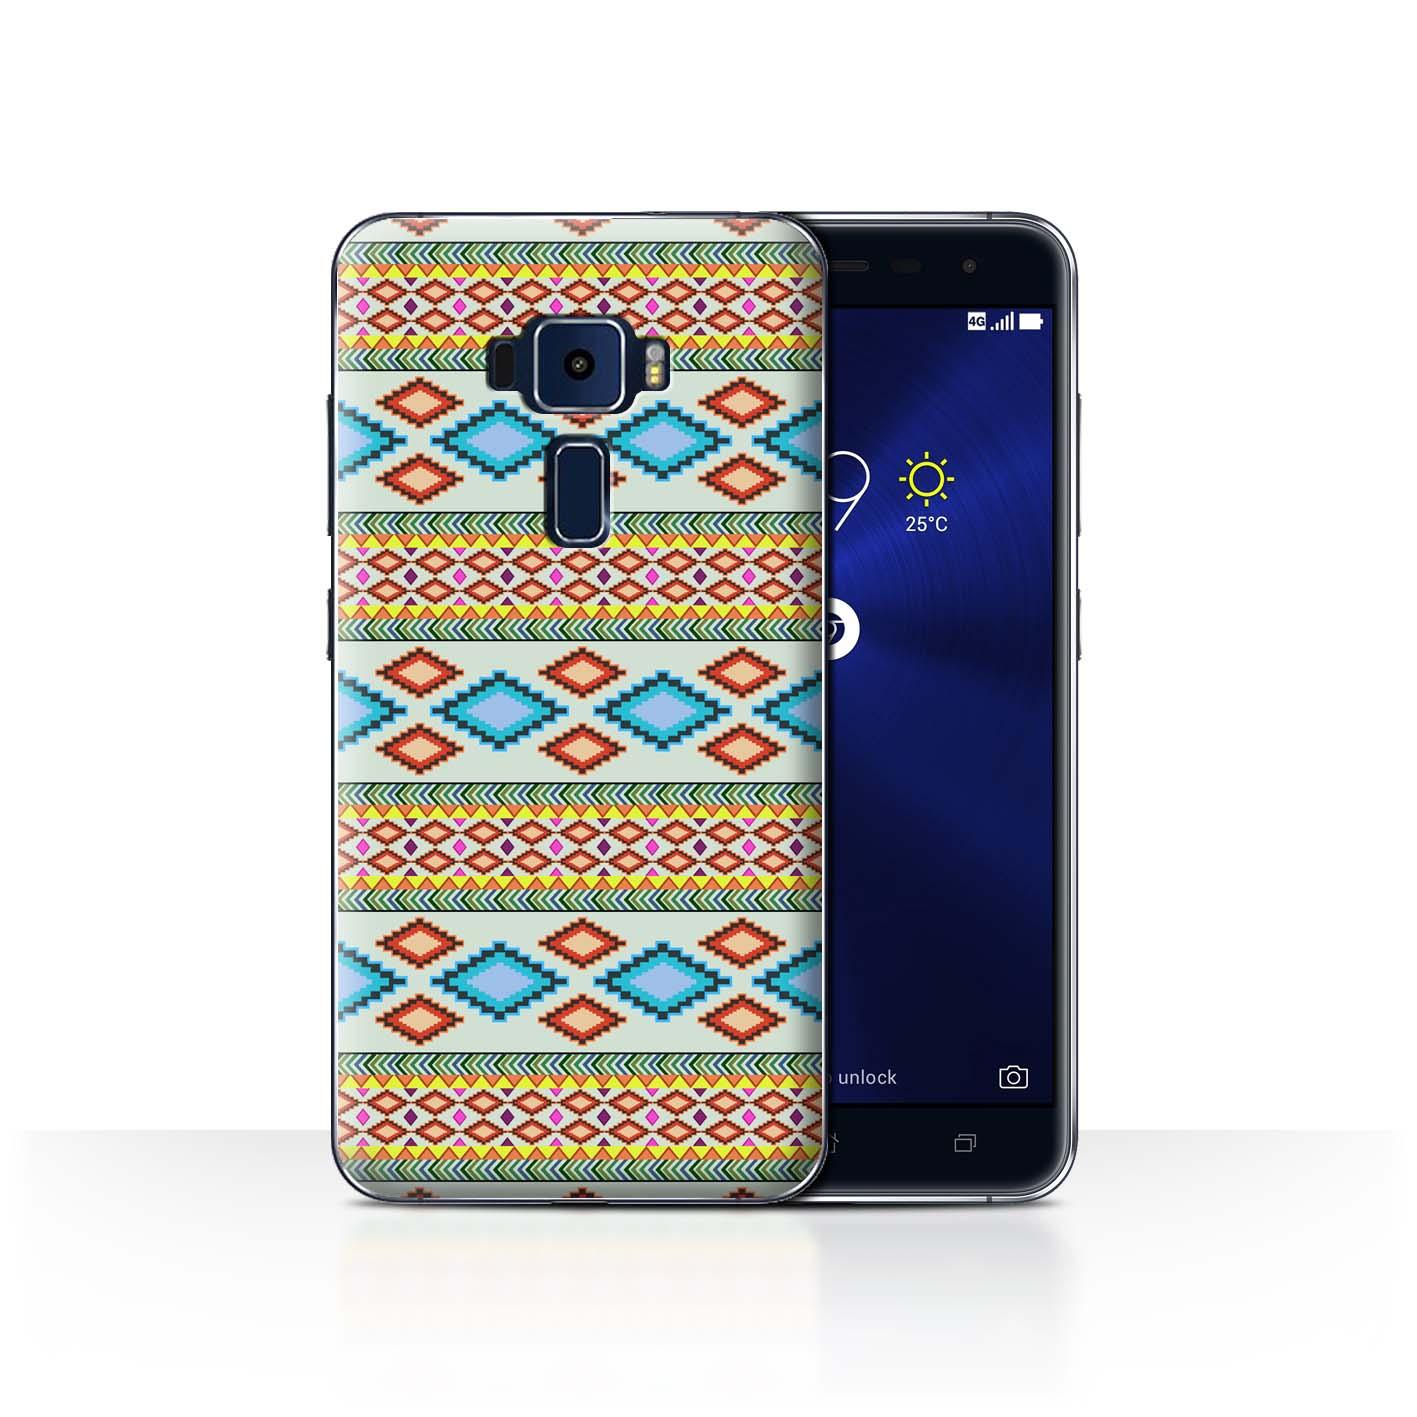 STUFF4-Back-Case-Cover-Skin-for-Asus-Zenfone-3-ZE552KL-Aztec-Tribal-Pattern